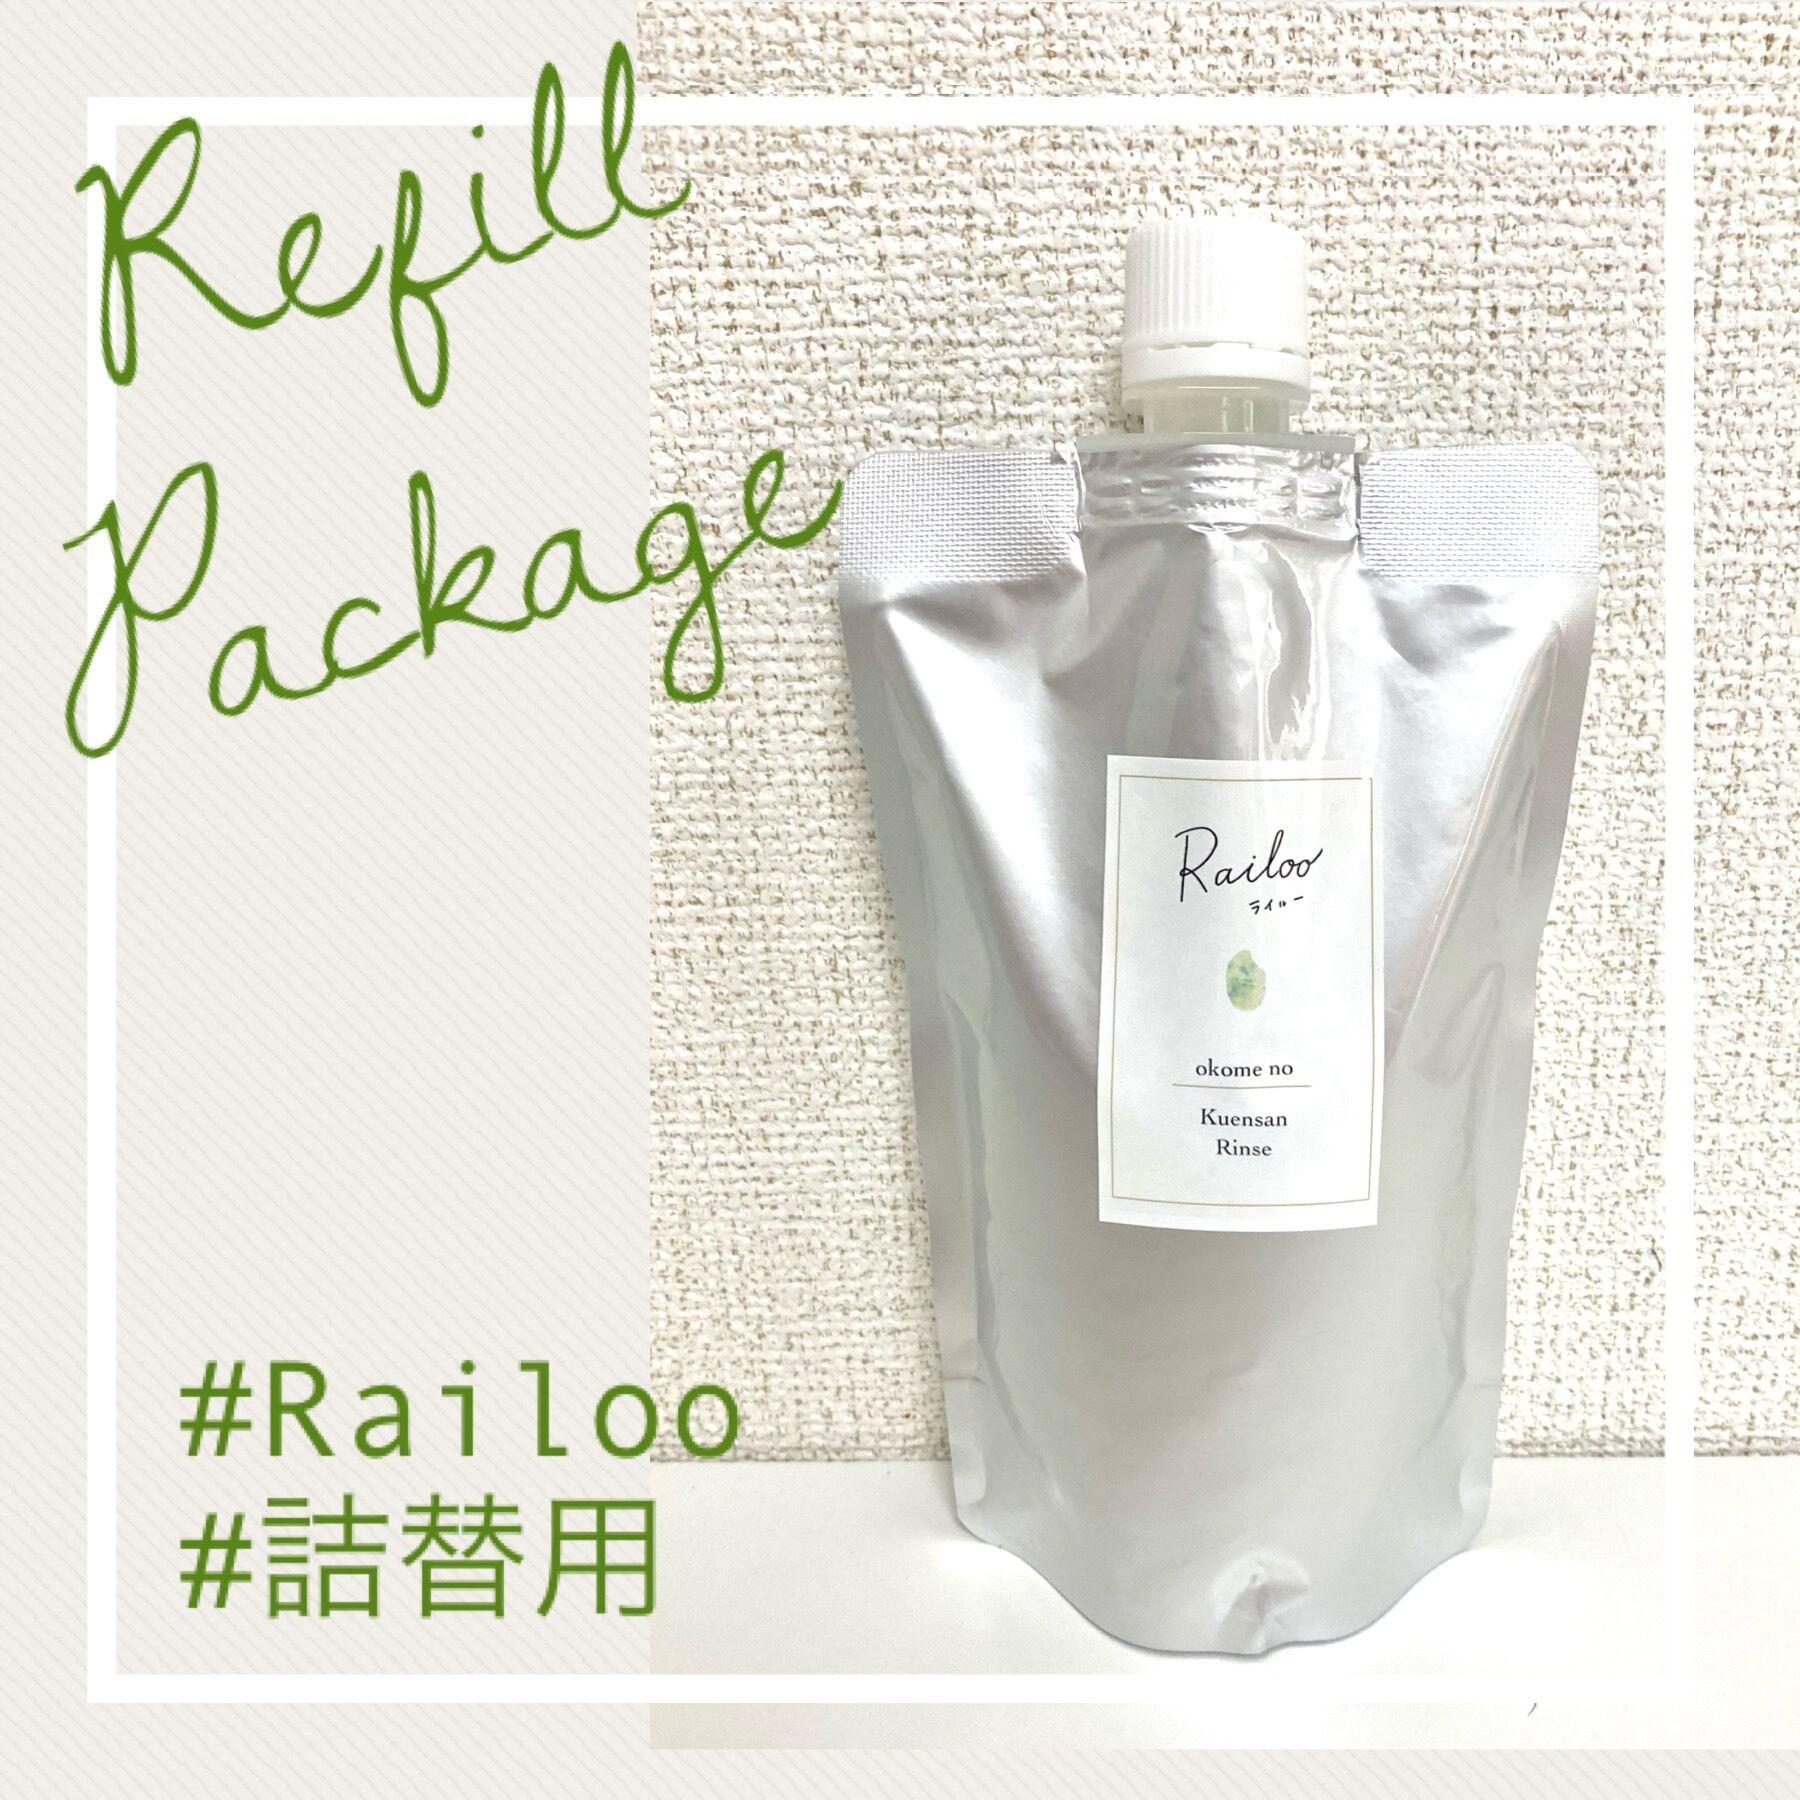 Railooアンバサダー限定◇詰替用◇ライルーお米のクエン酸リンス◇300mL